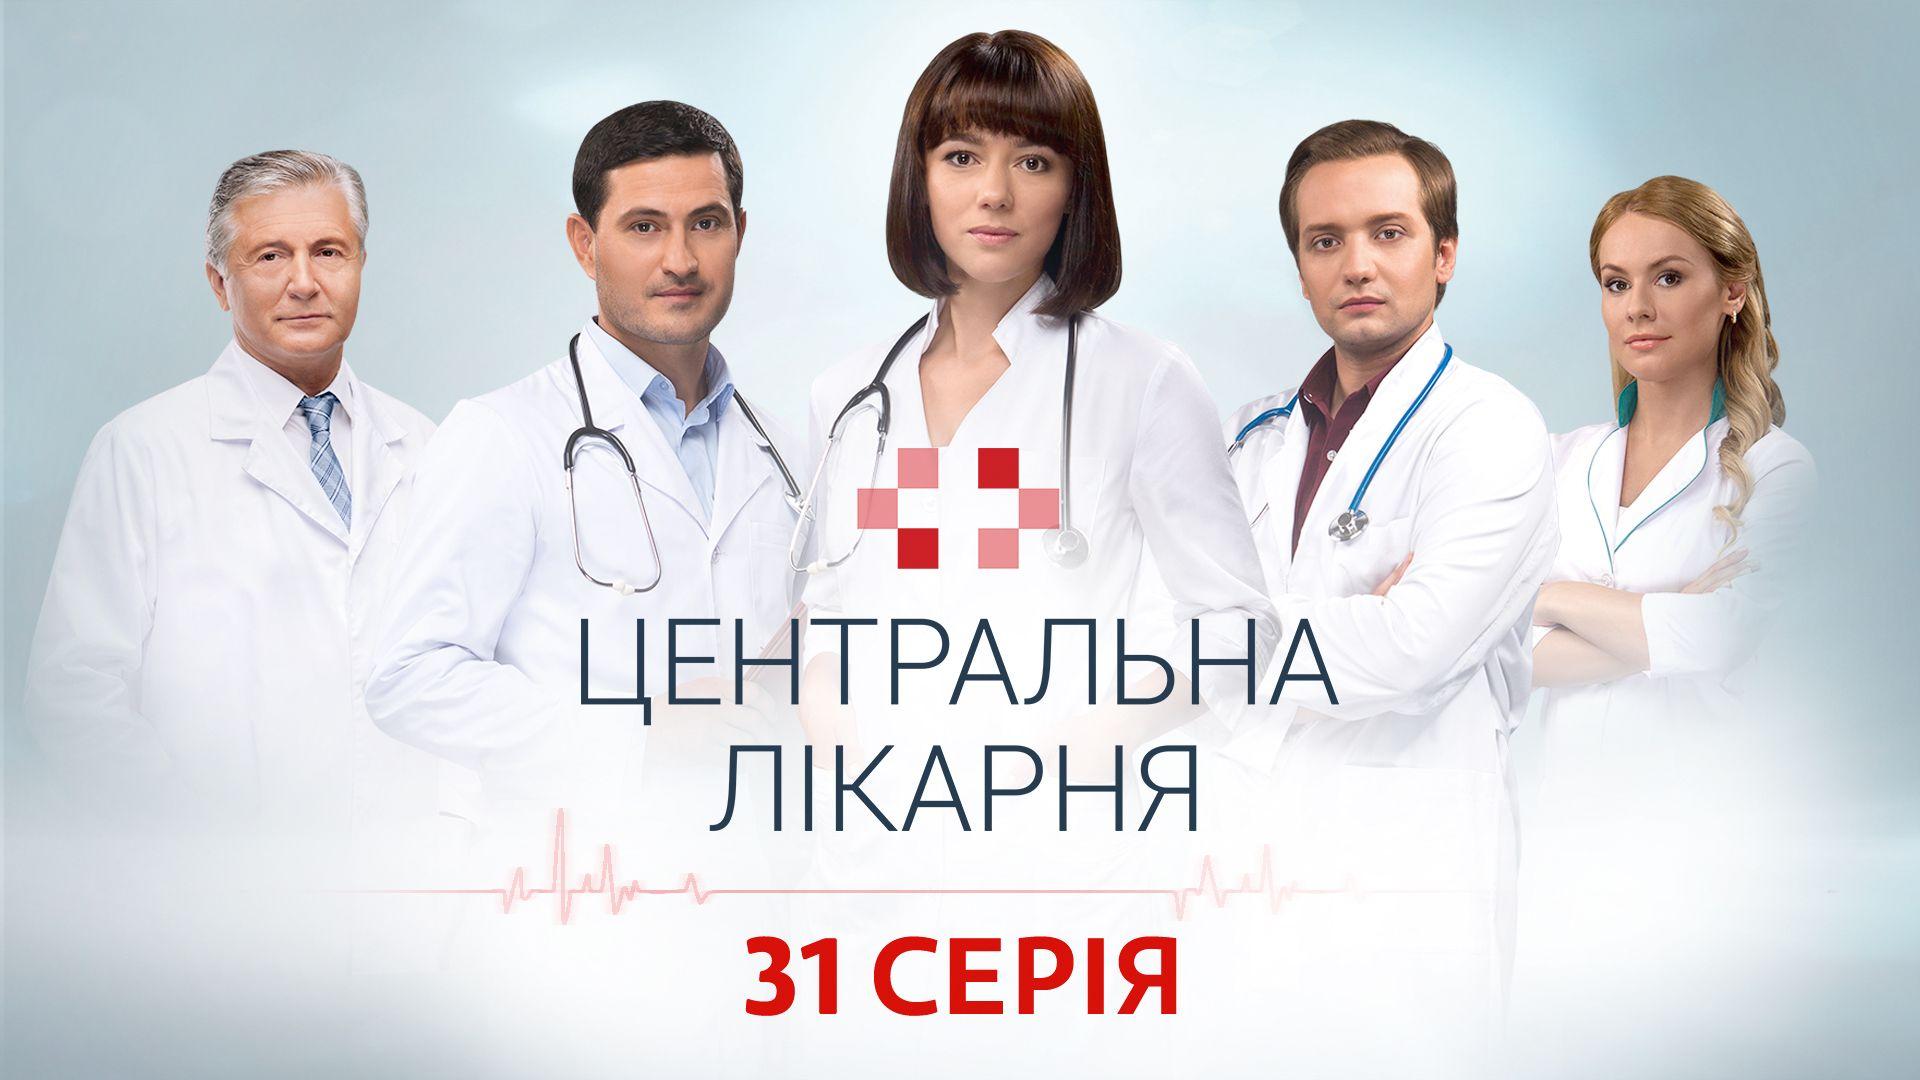 Врачи поликлиники 69 москва